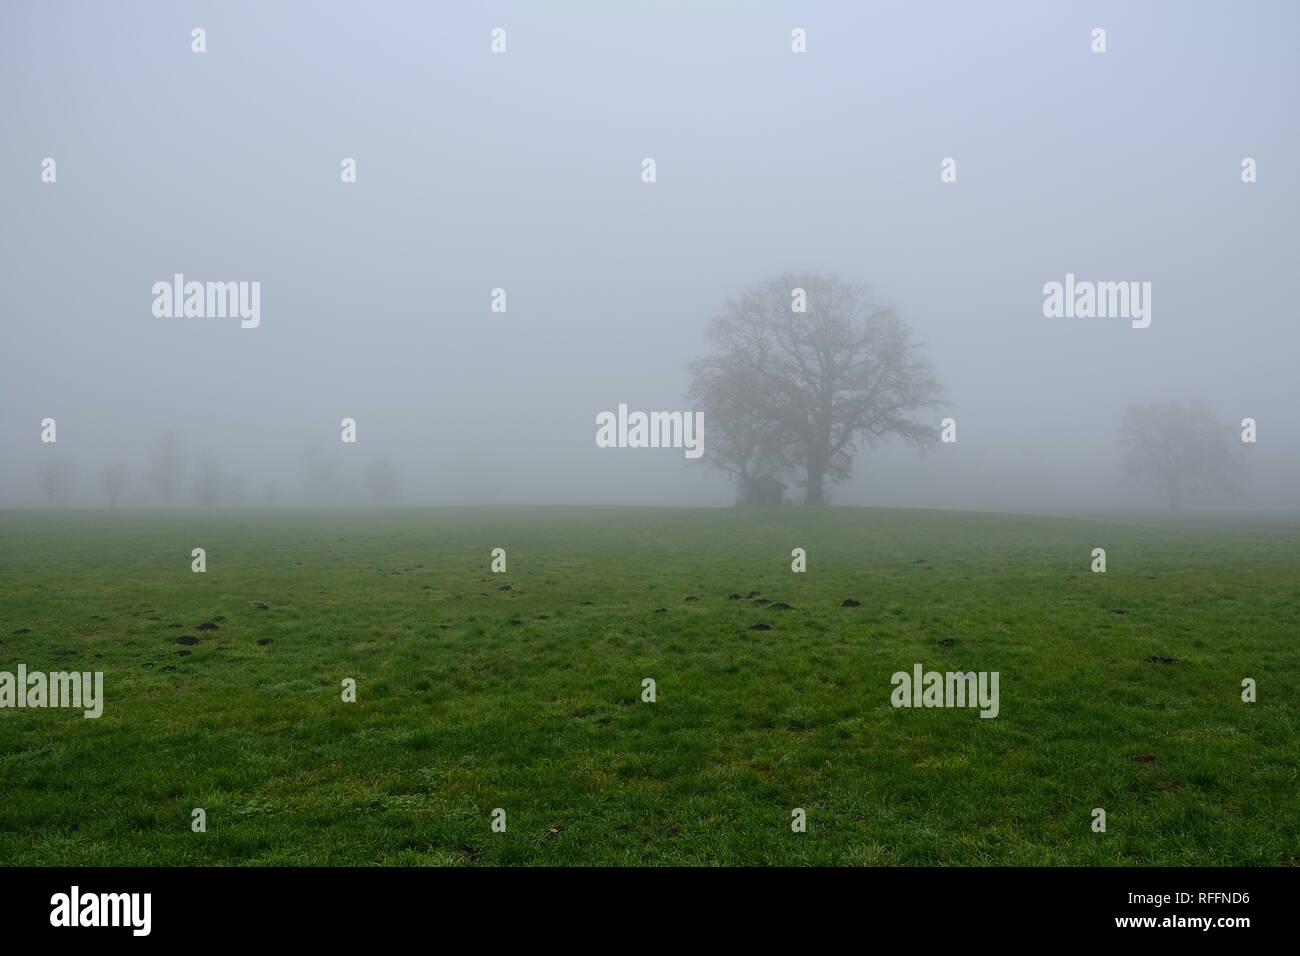 Nebel in Oberbayern bei Eberfing - Stock Image